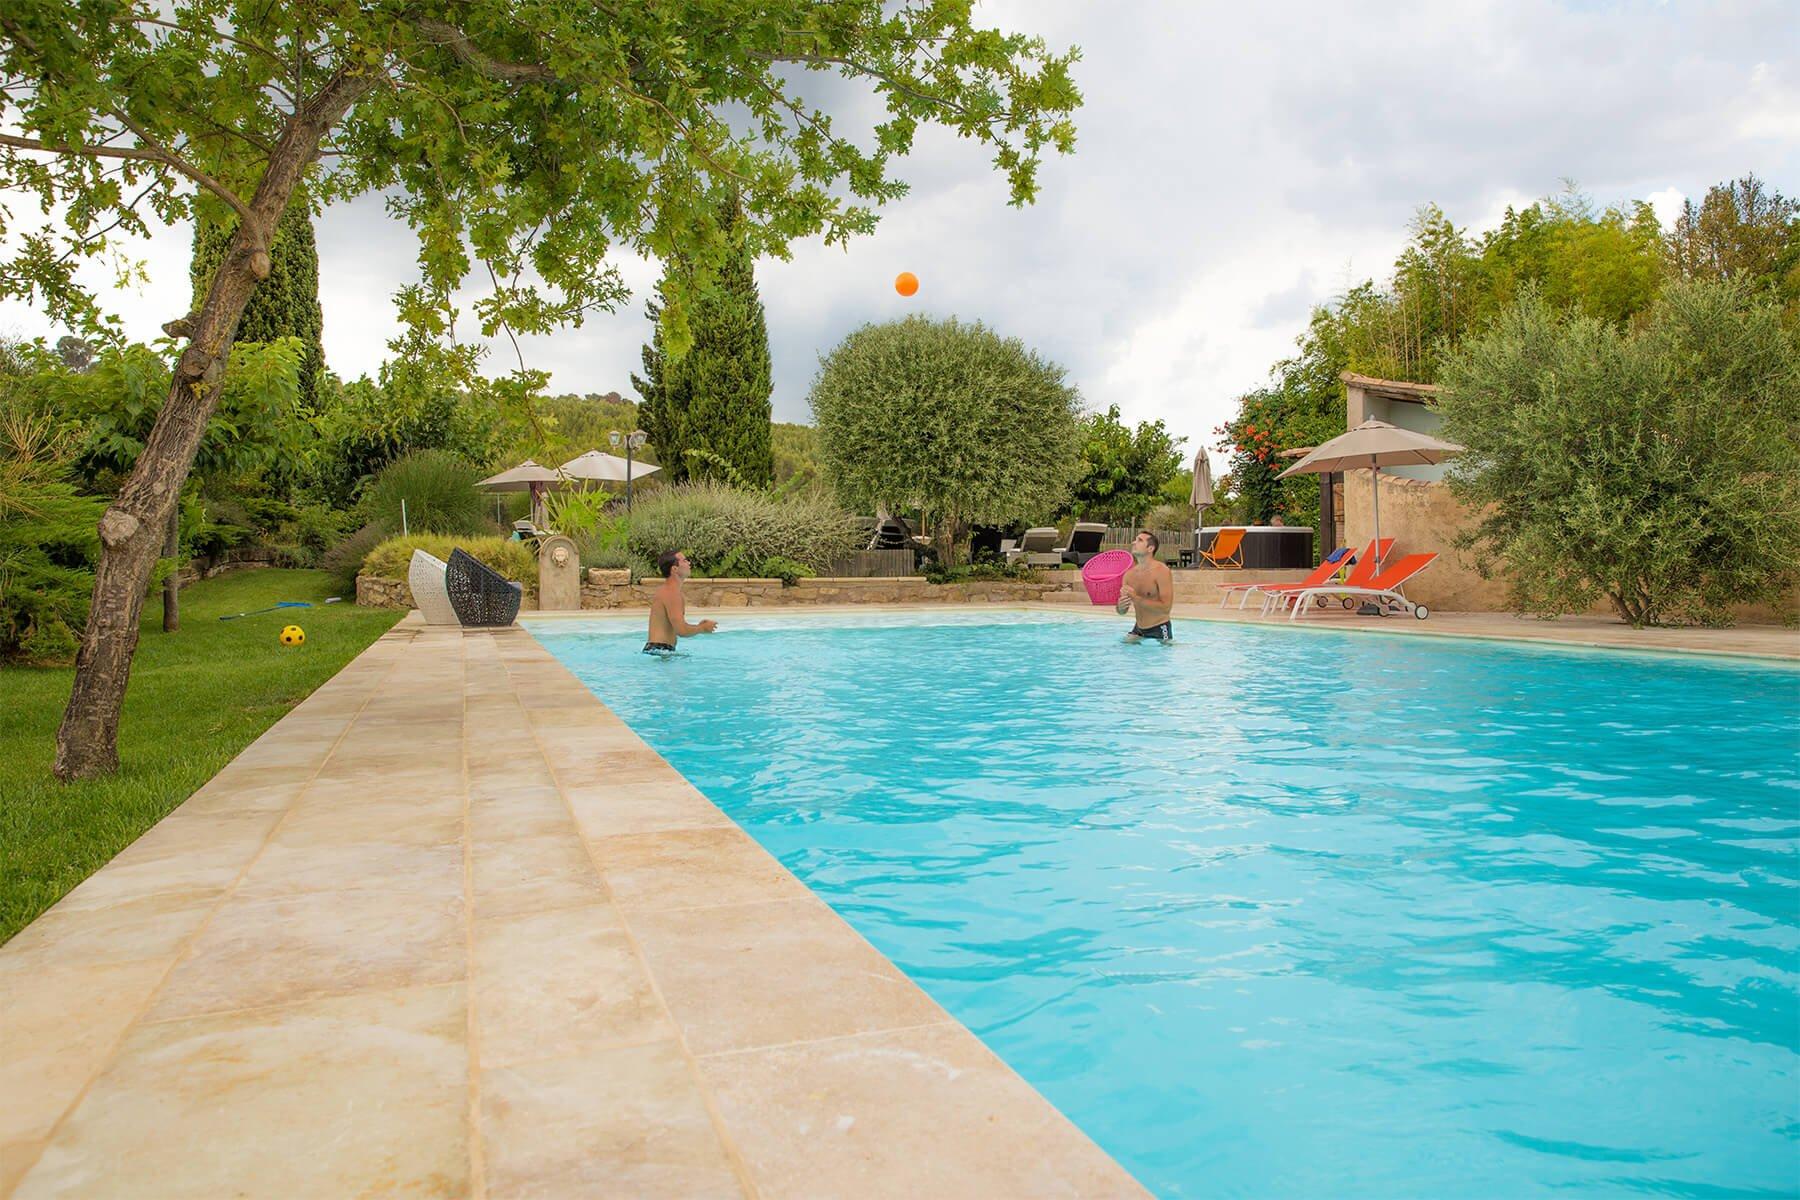 mas de thau piscine vacances loisirs